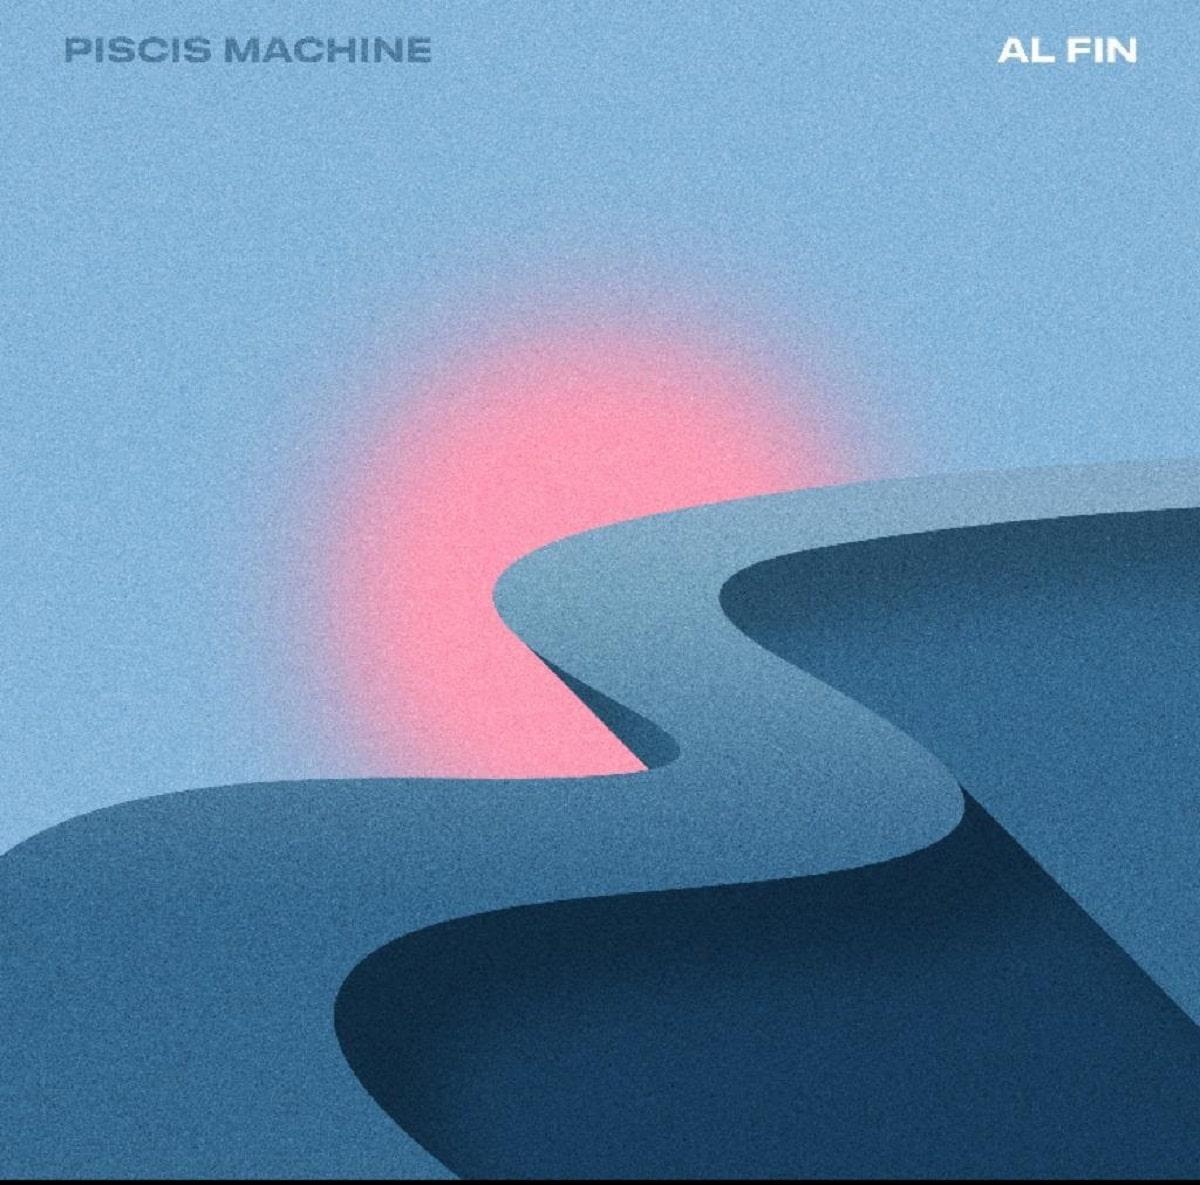 """Al fin"", lo nuevo de Piscis Machine"